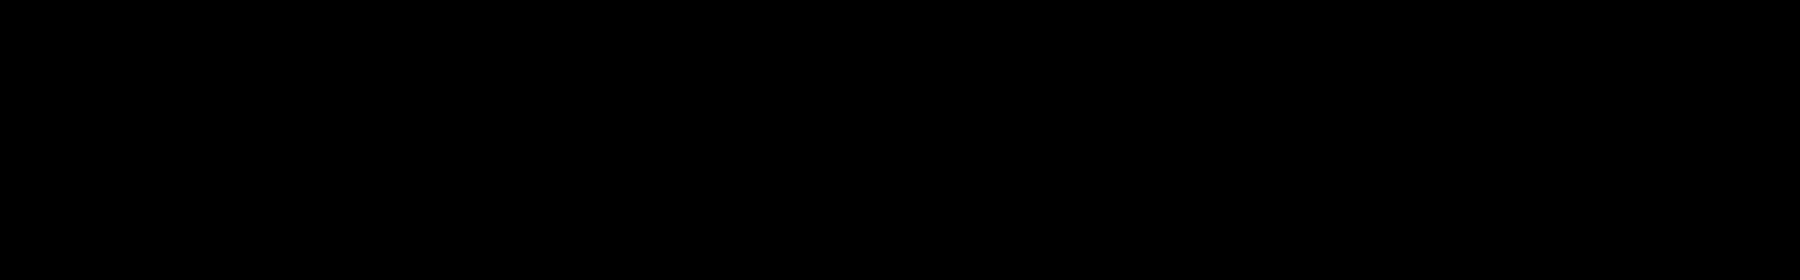 Synthwave Loops audio waveform